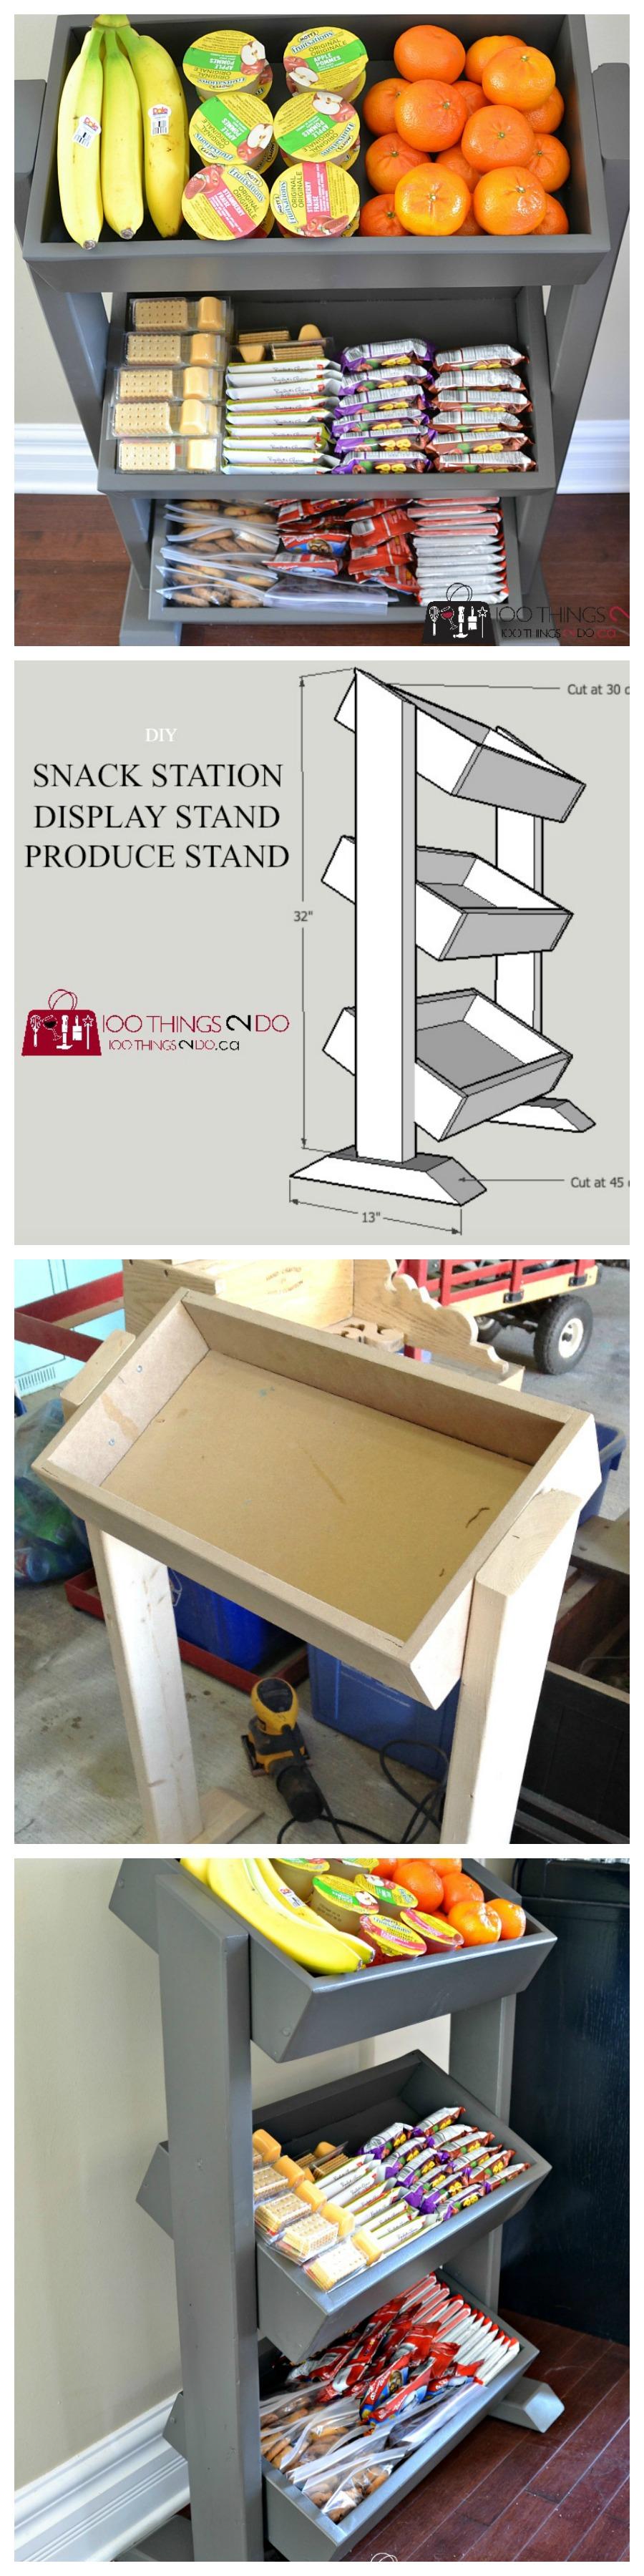 DIY Snack Station DIY Produce Stand DIY Display Stand